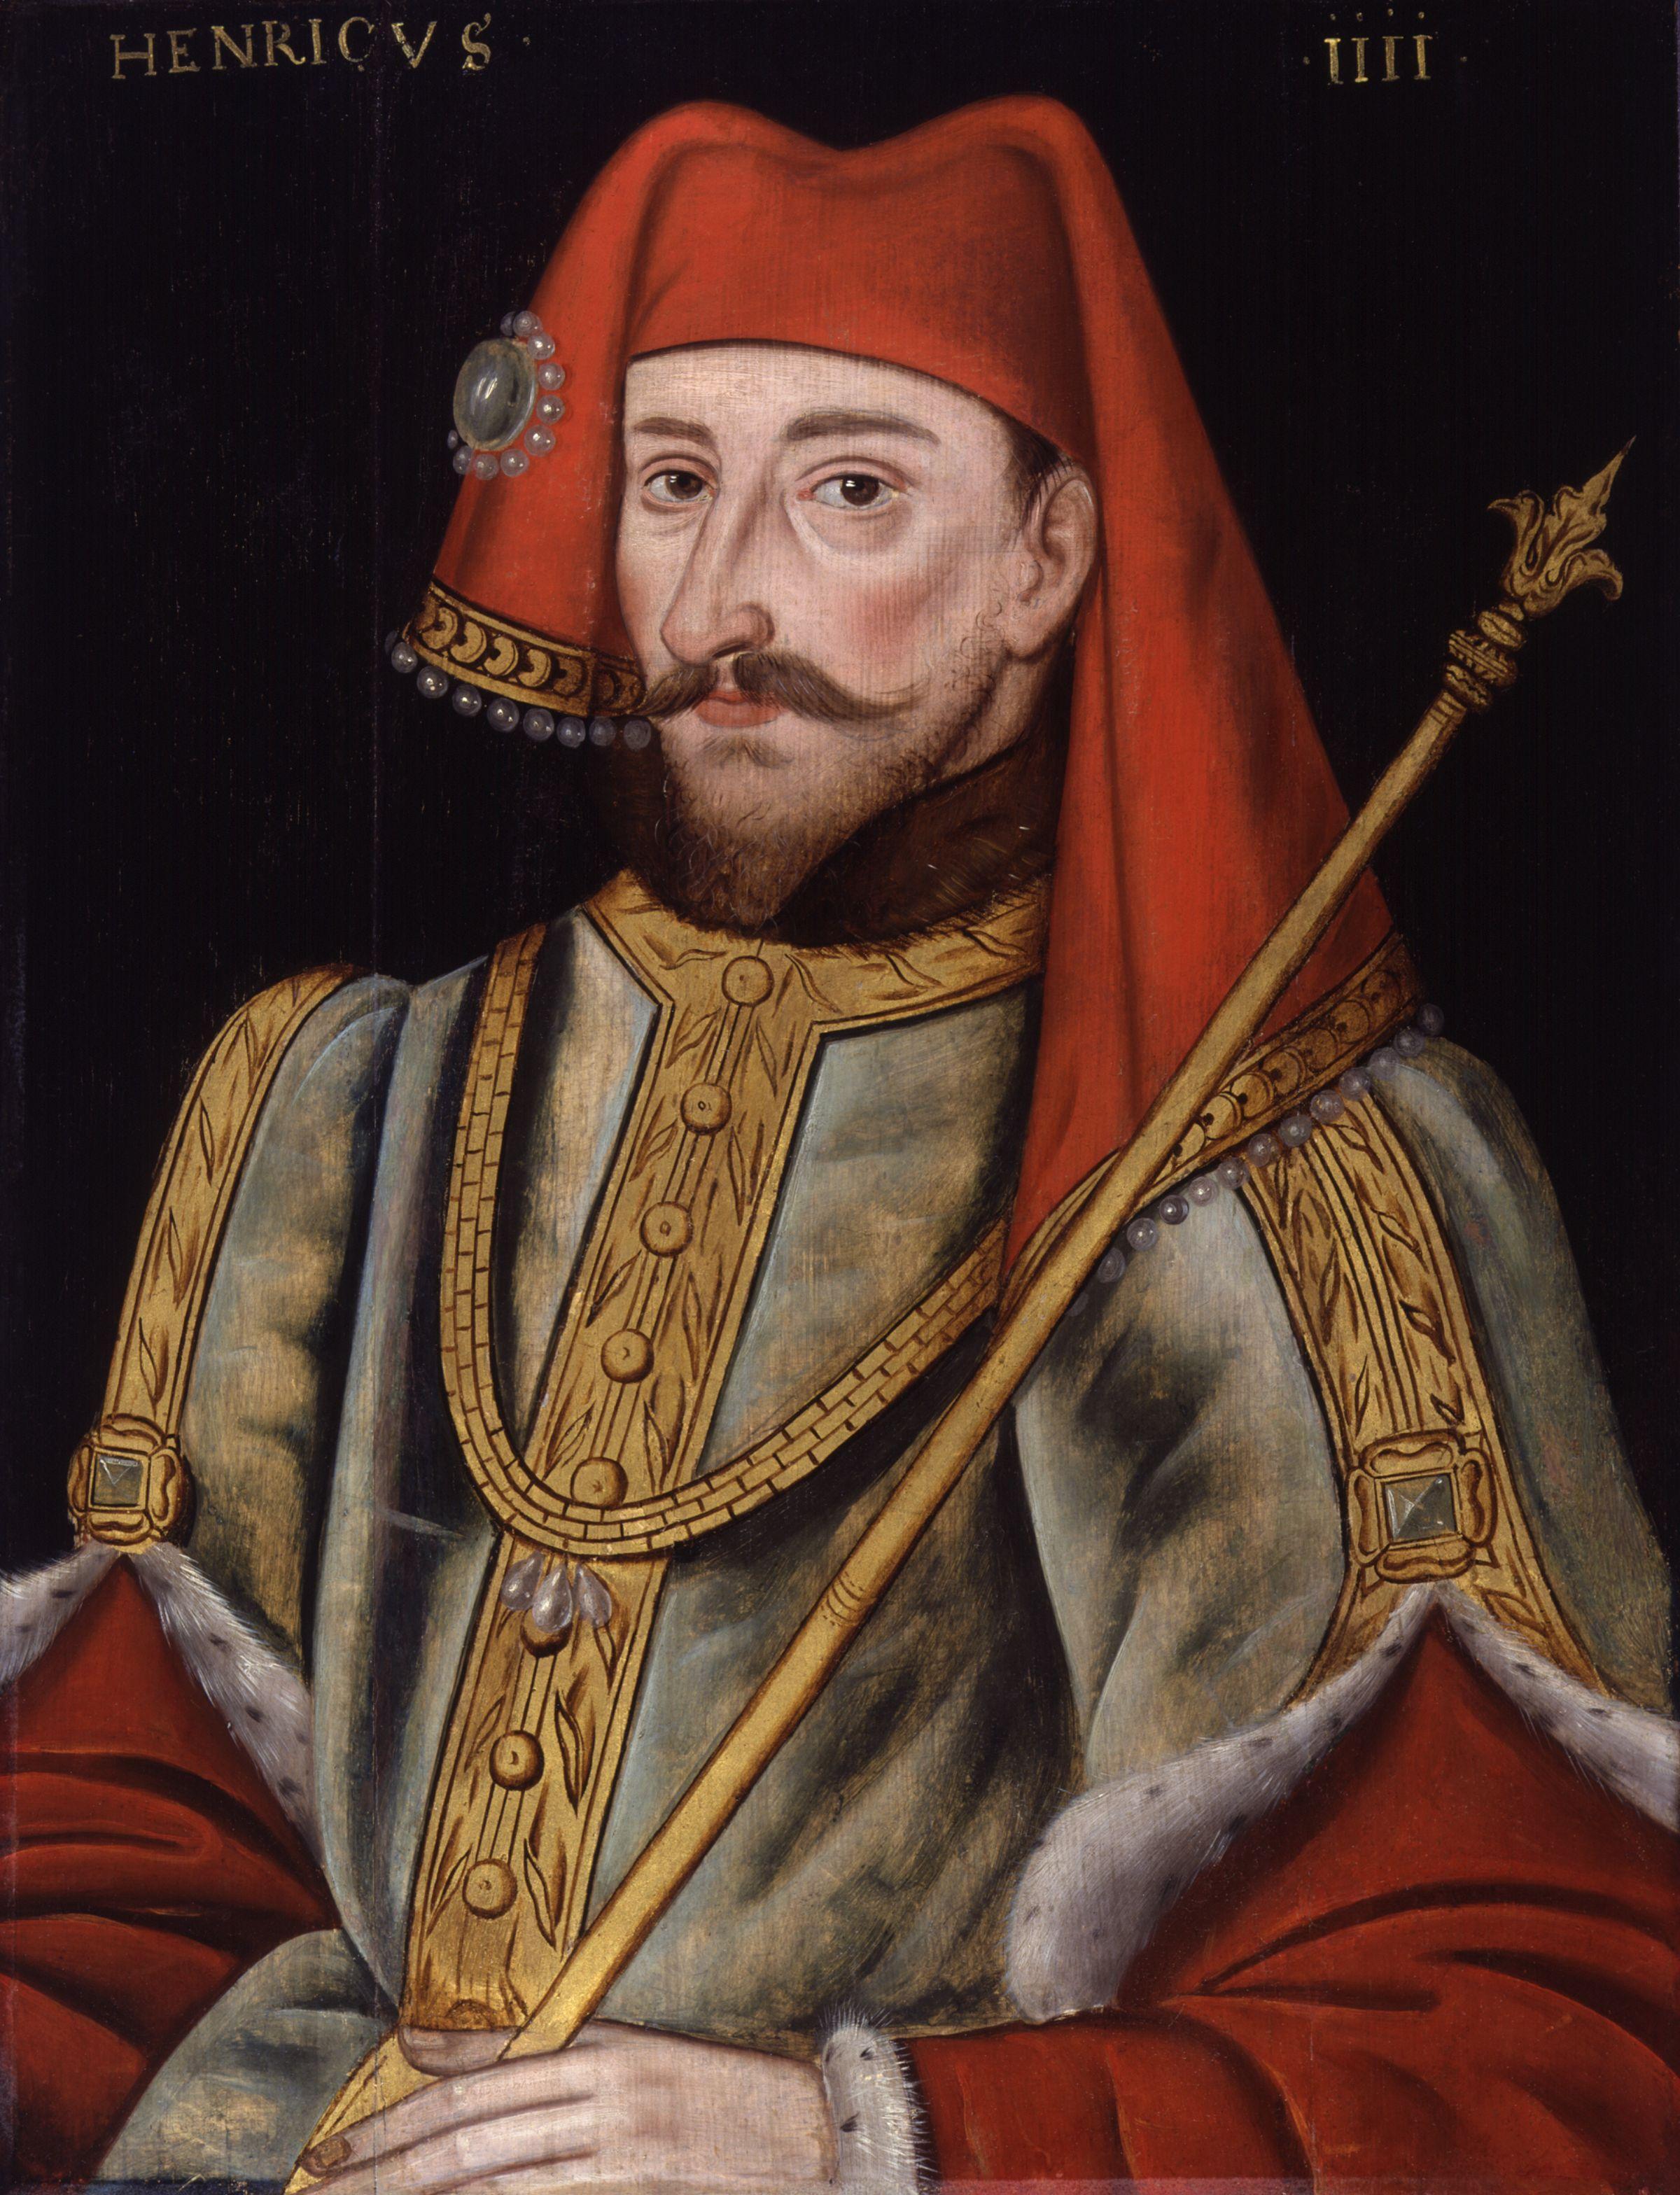 Henryk IV Lancaster